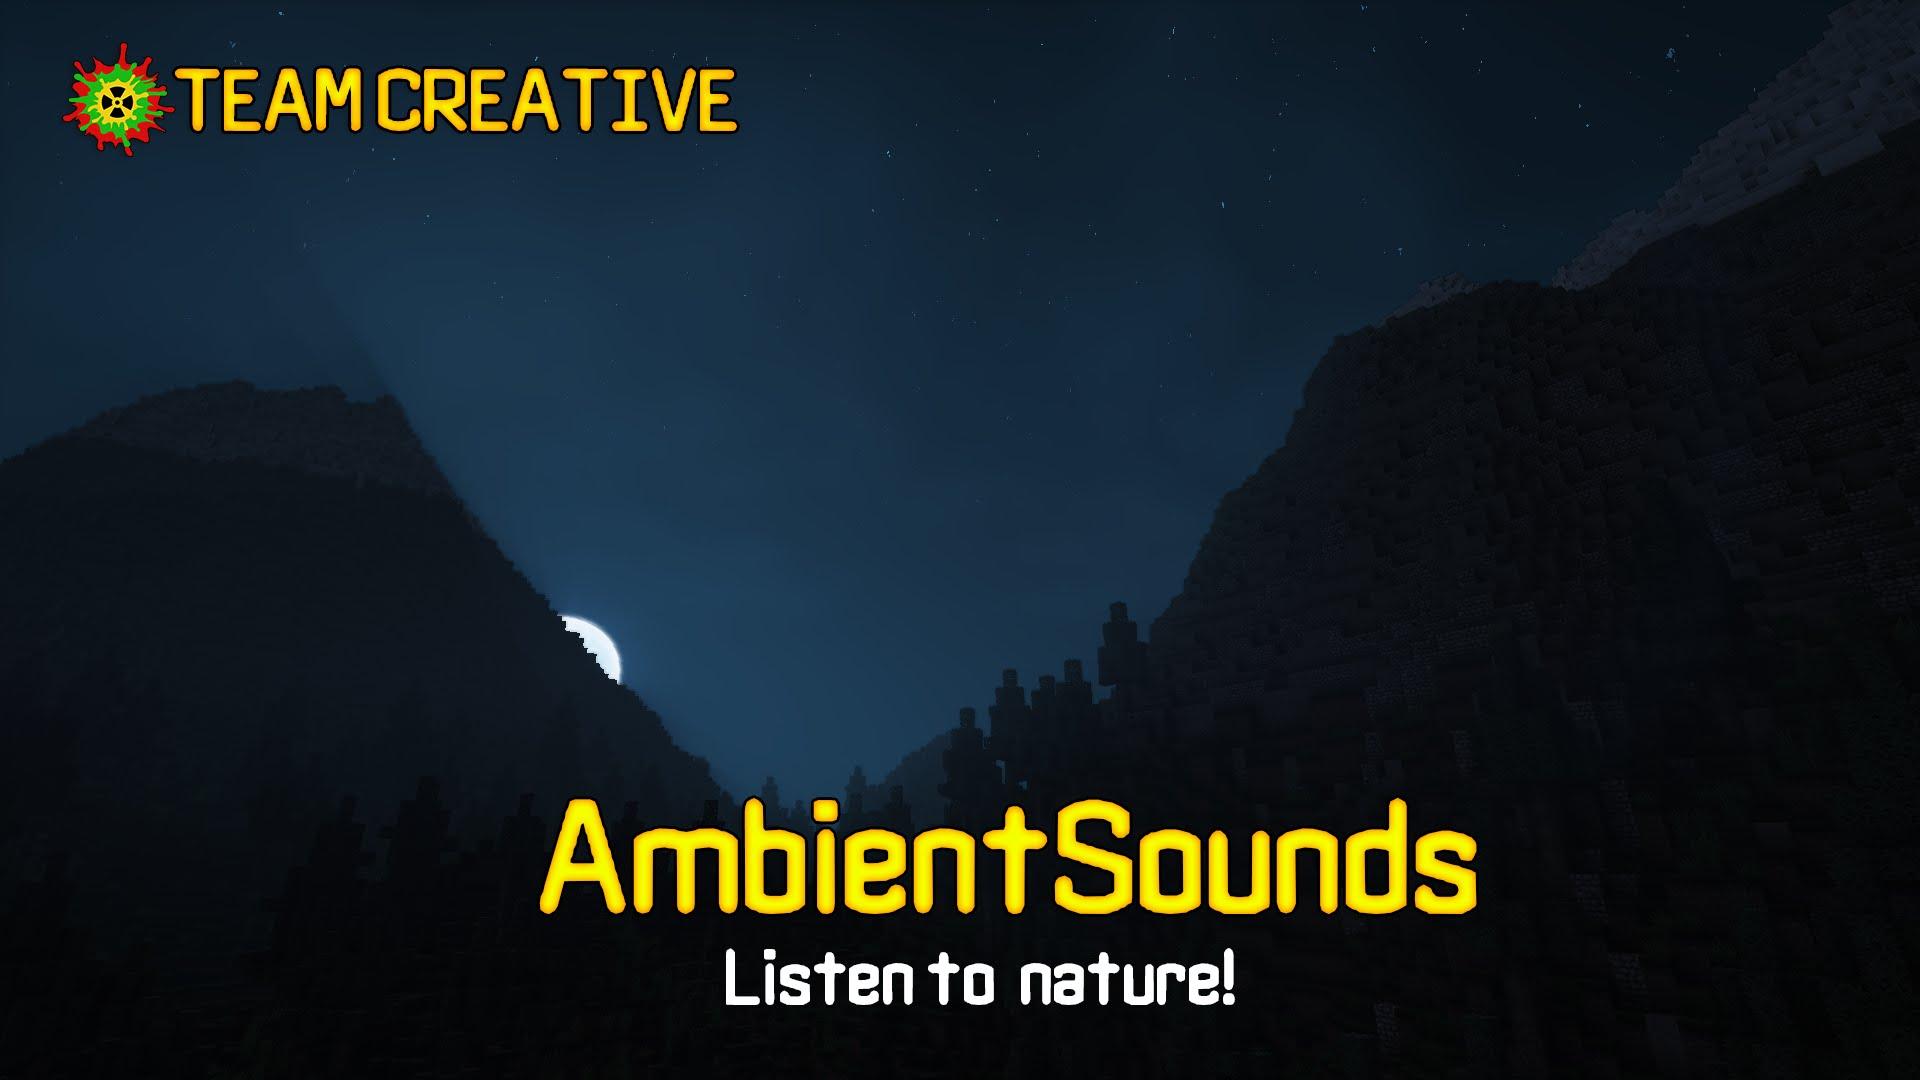 Ambient Sounds Mod for Minecraft 1 12 2/1 11 2 | MinecraftSix